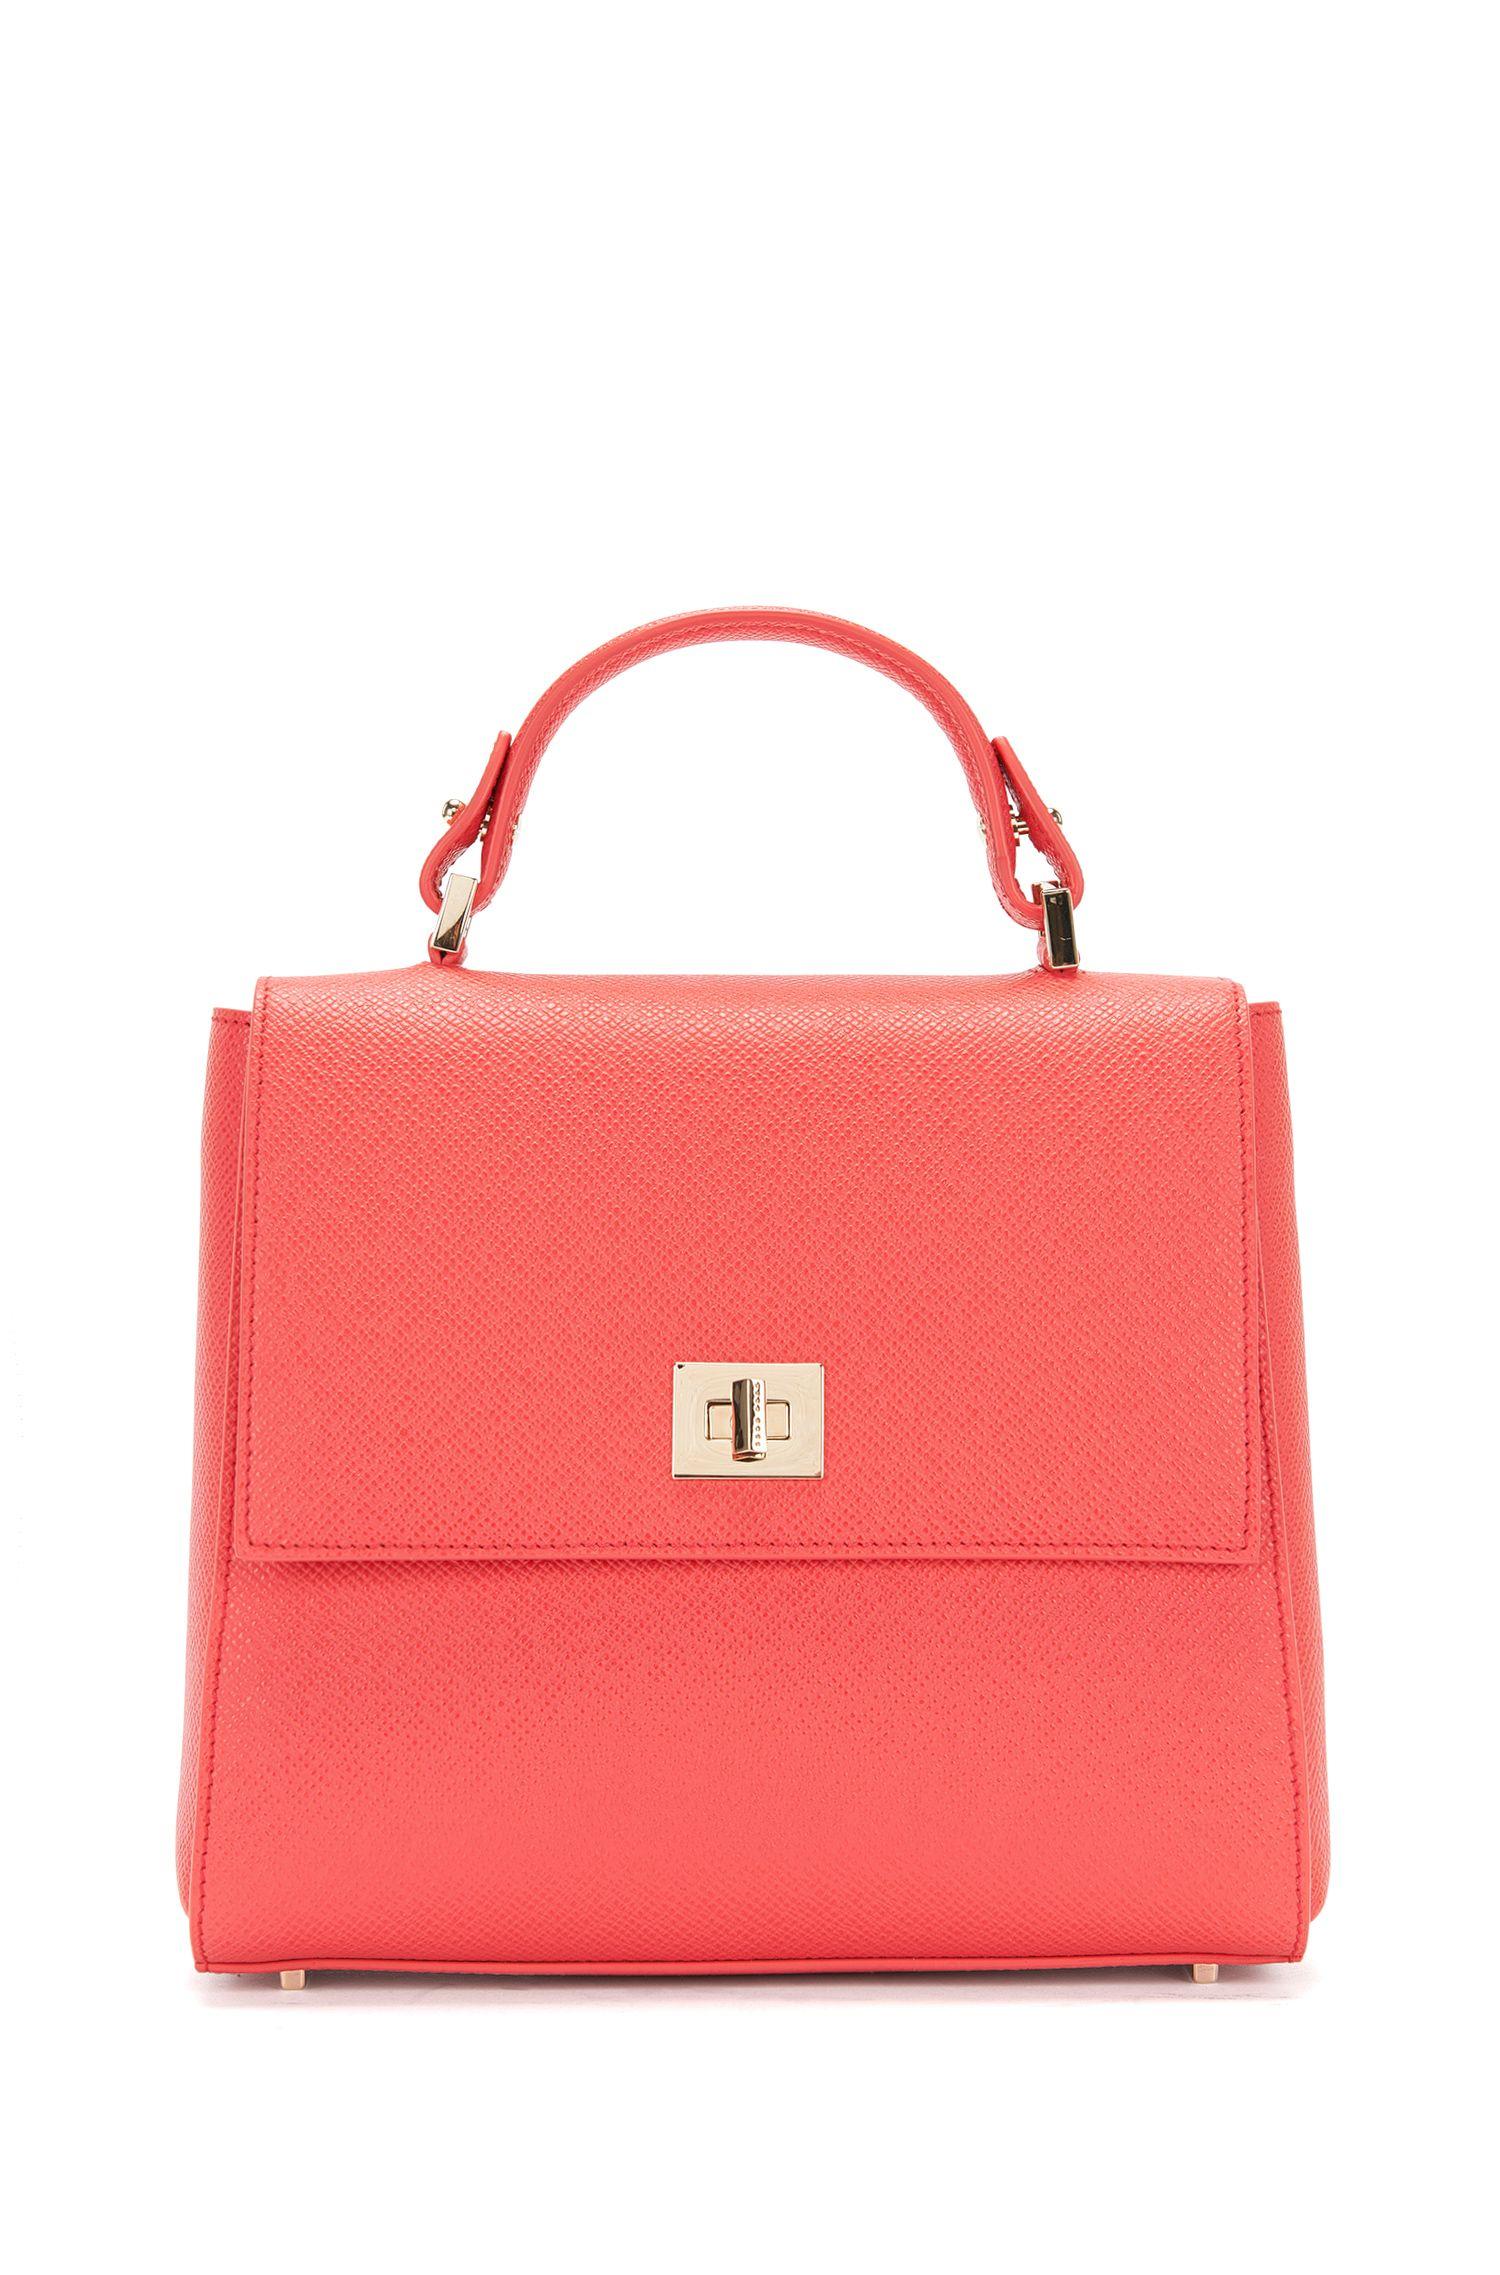 'Bespoke' | Calfskin Bag, Detachable Strap